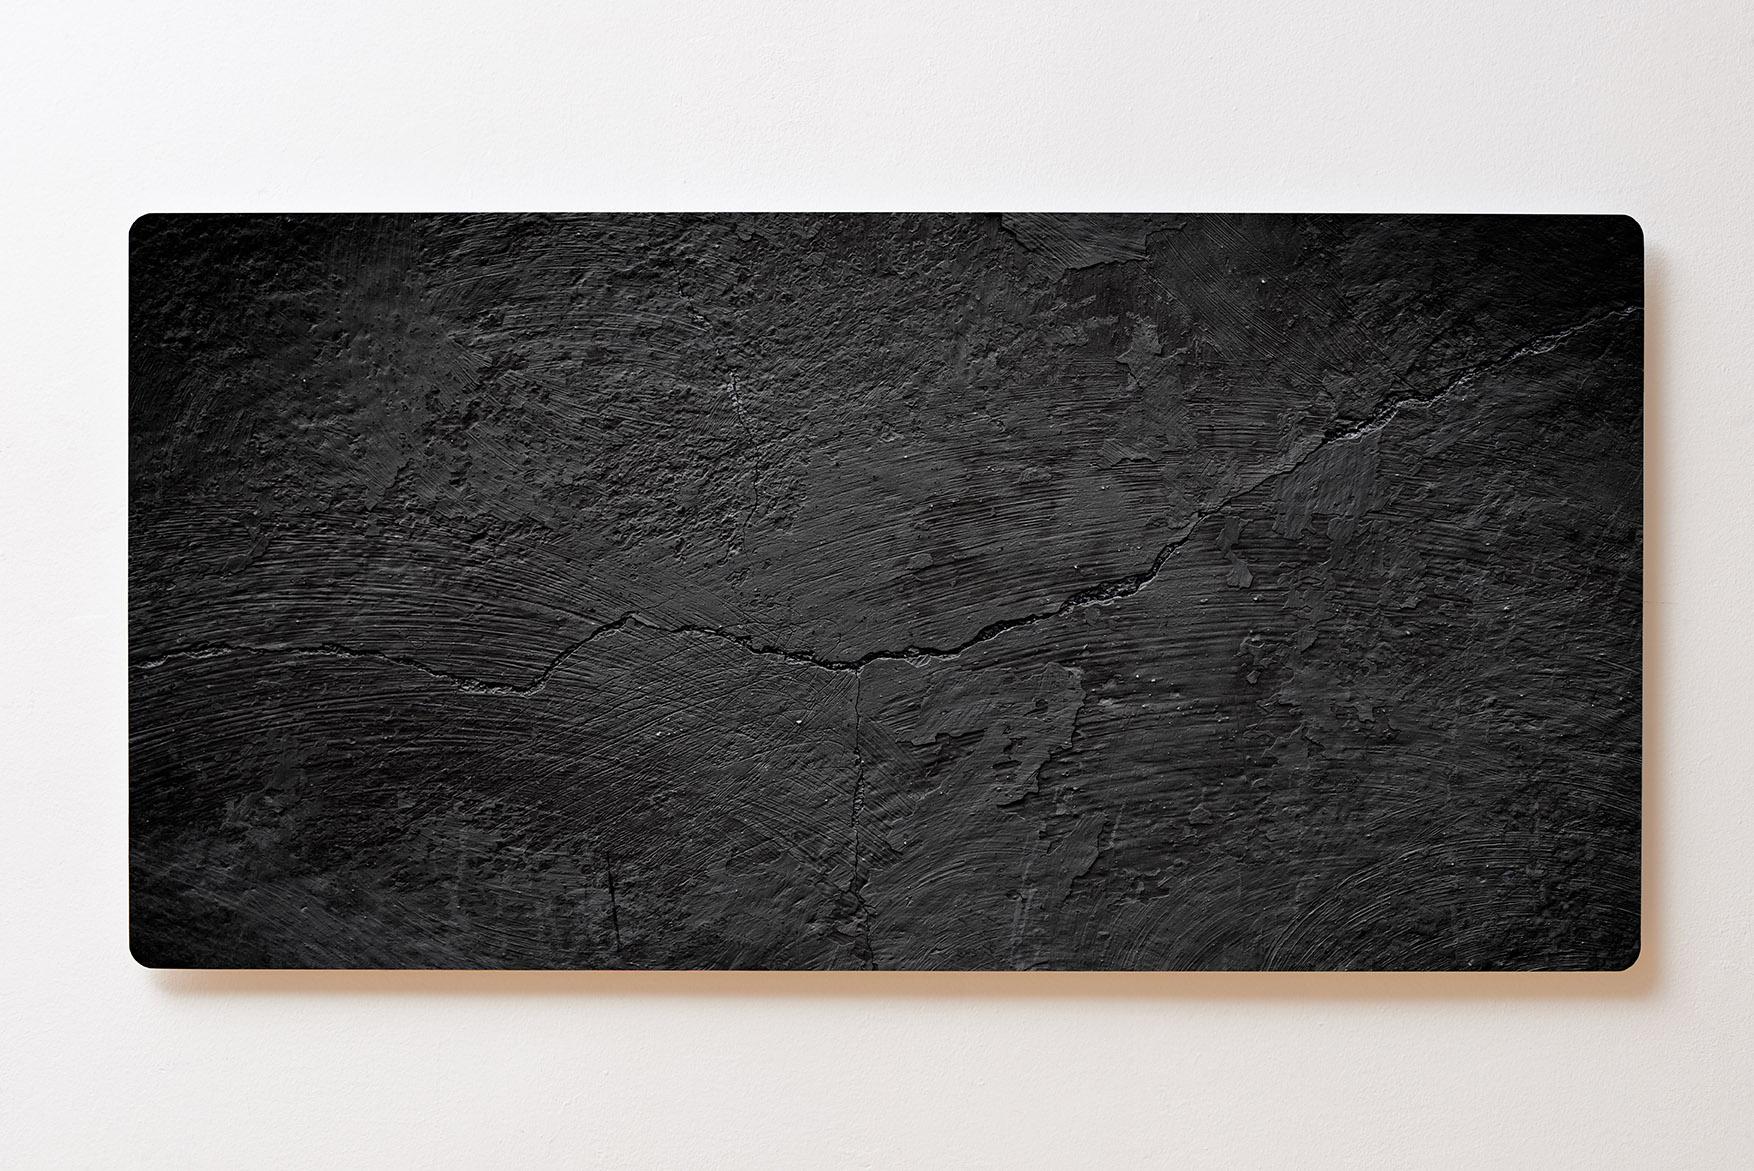 Magnettafel BACKLIGHT 120x60cm Motiv-Wandbild M115 Betonwand Schwarz